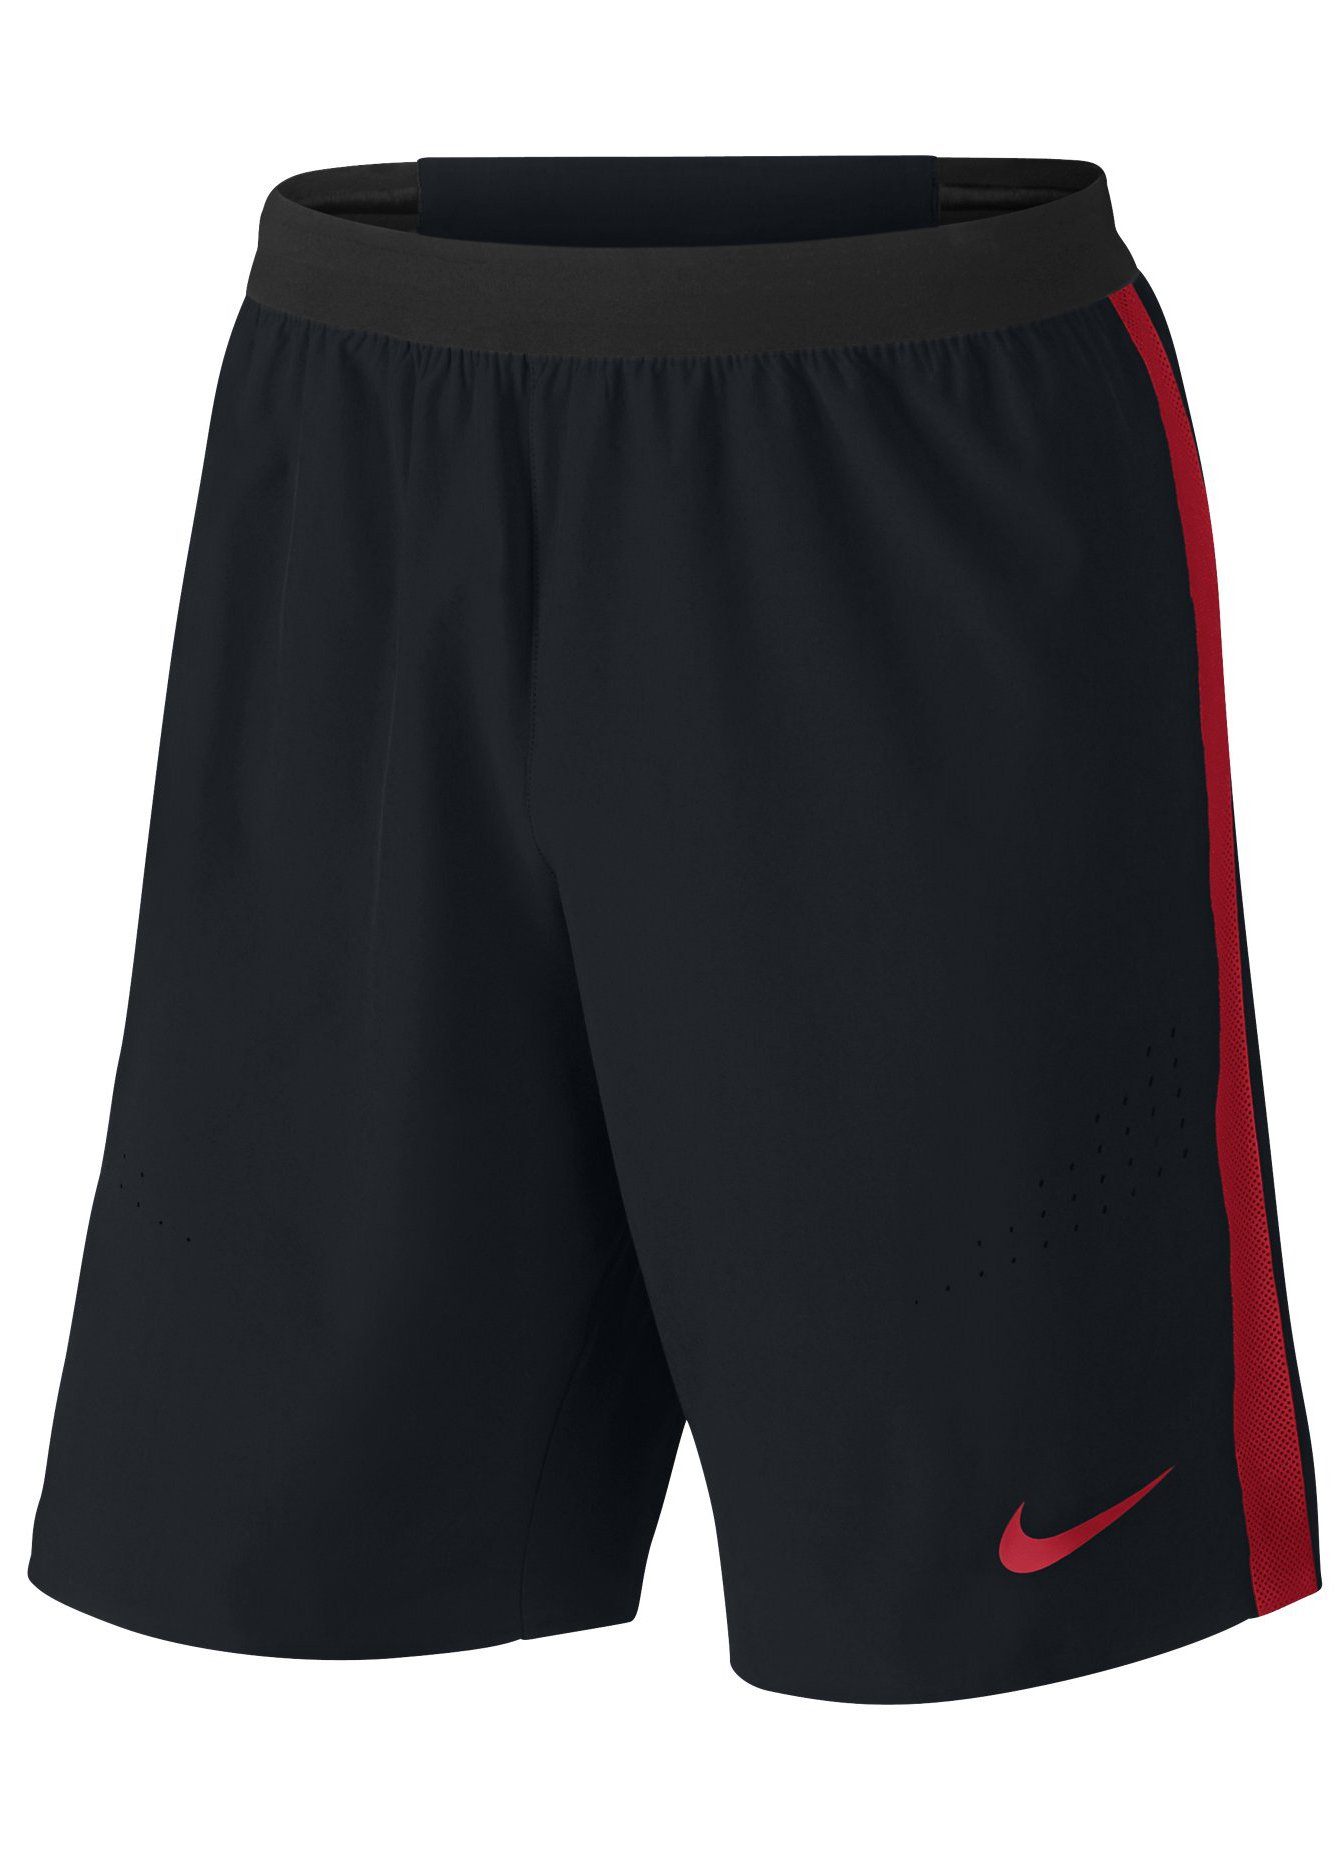 Šortky Nike STRIKE WVN SHRT EL